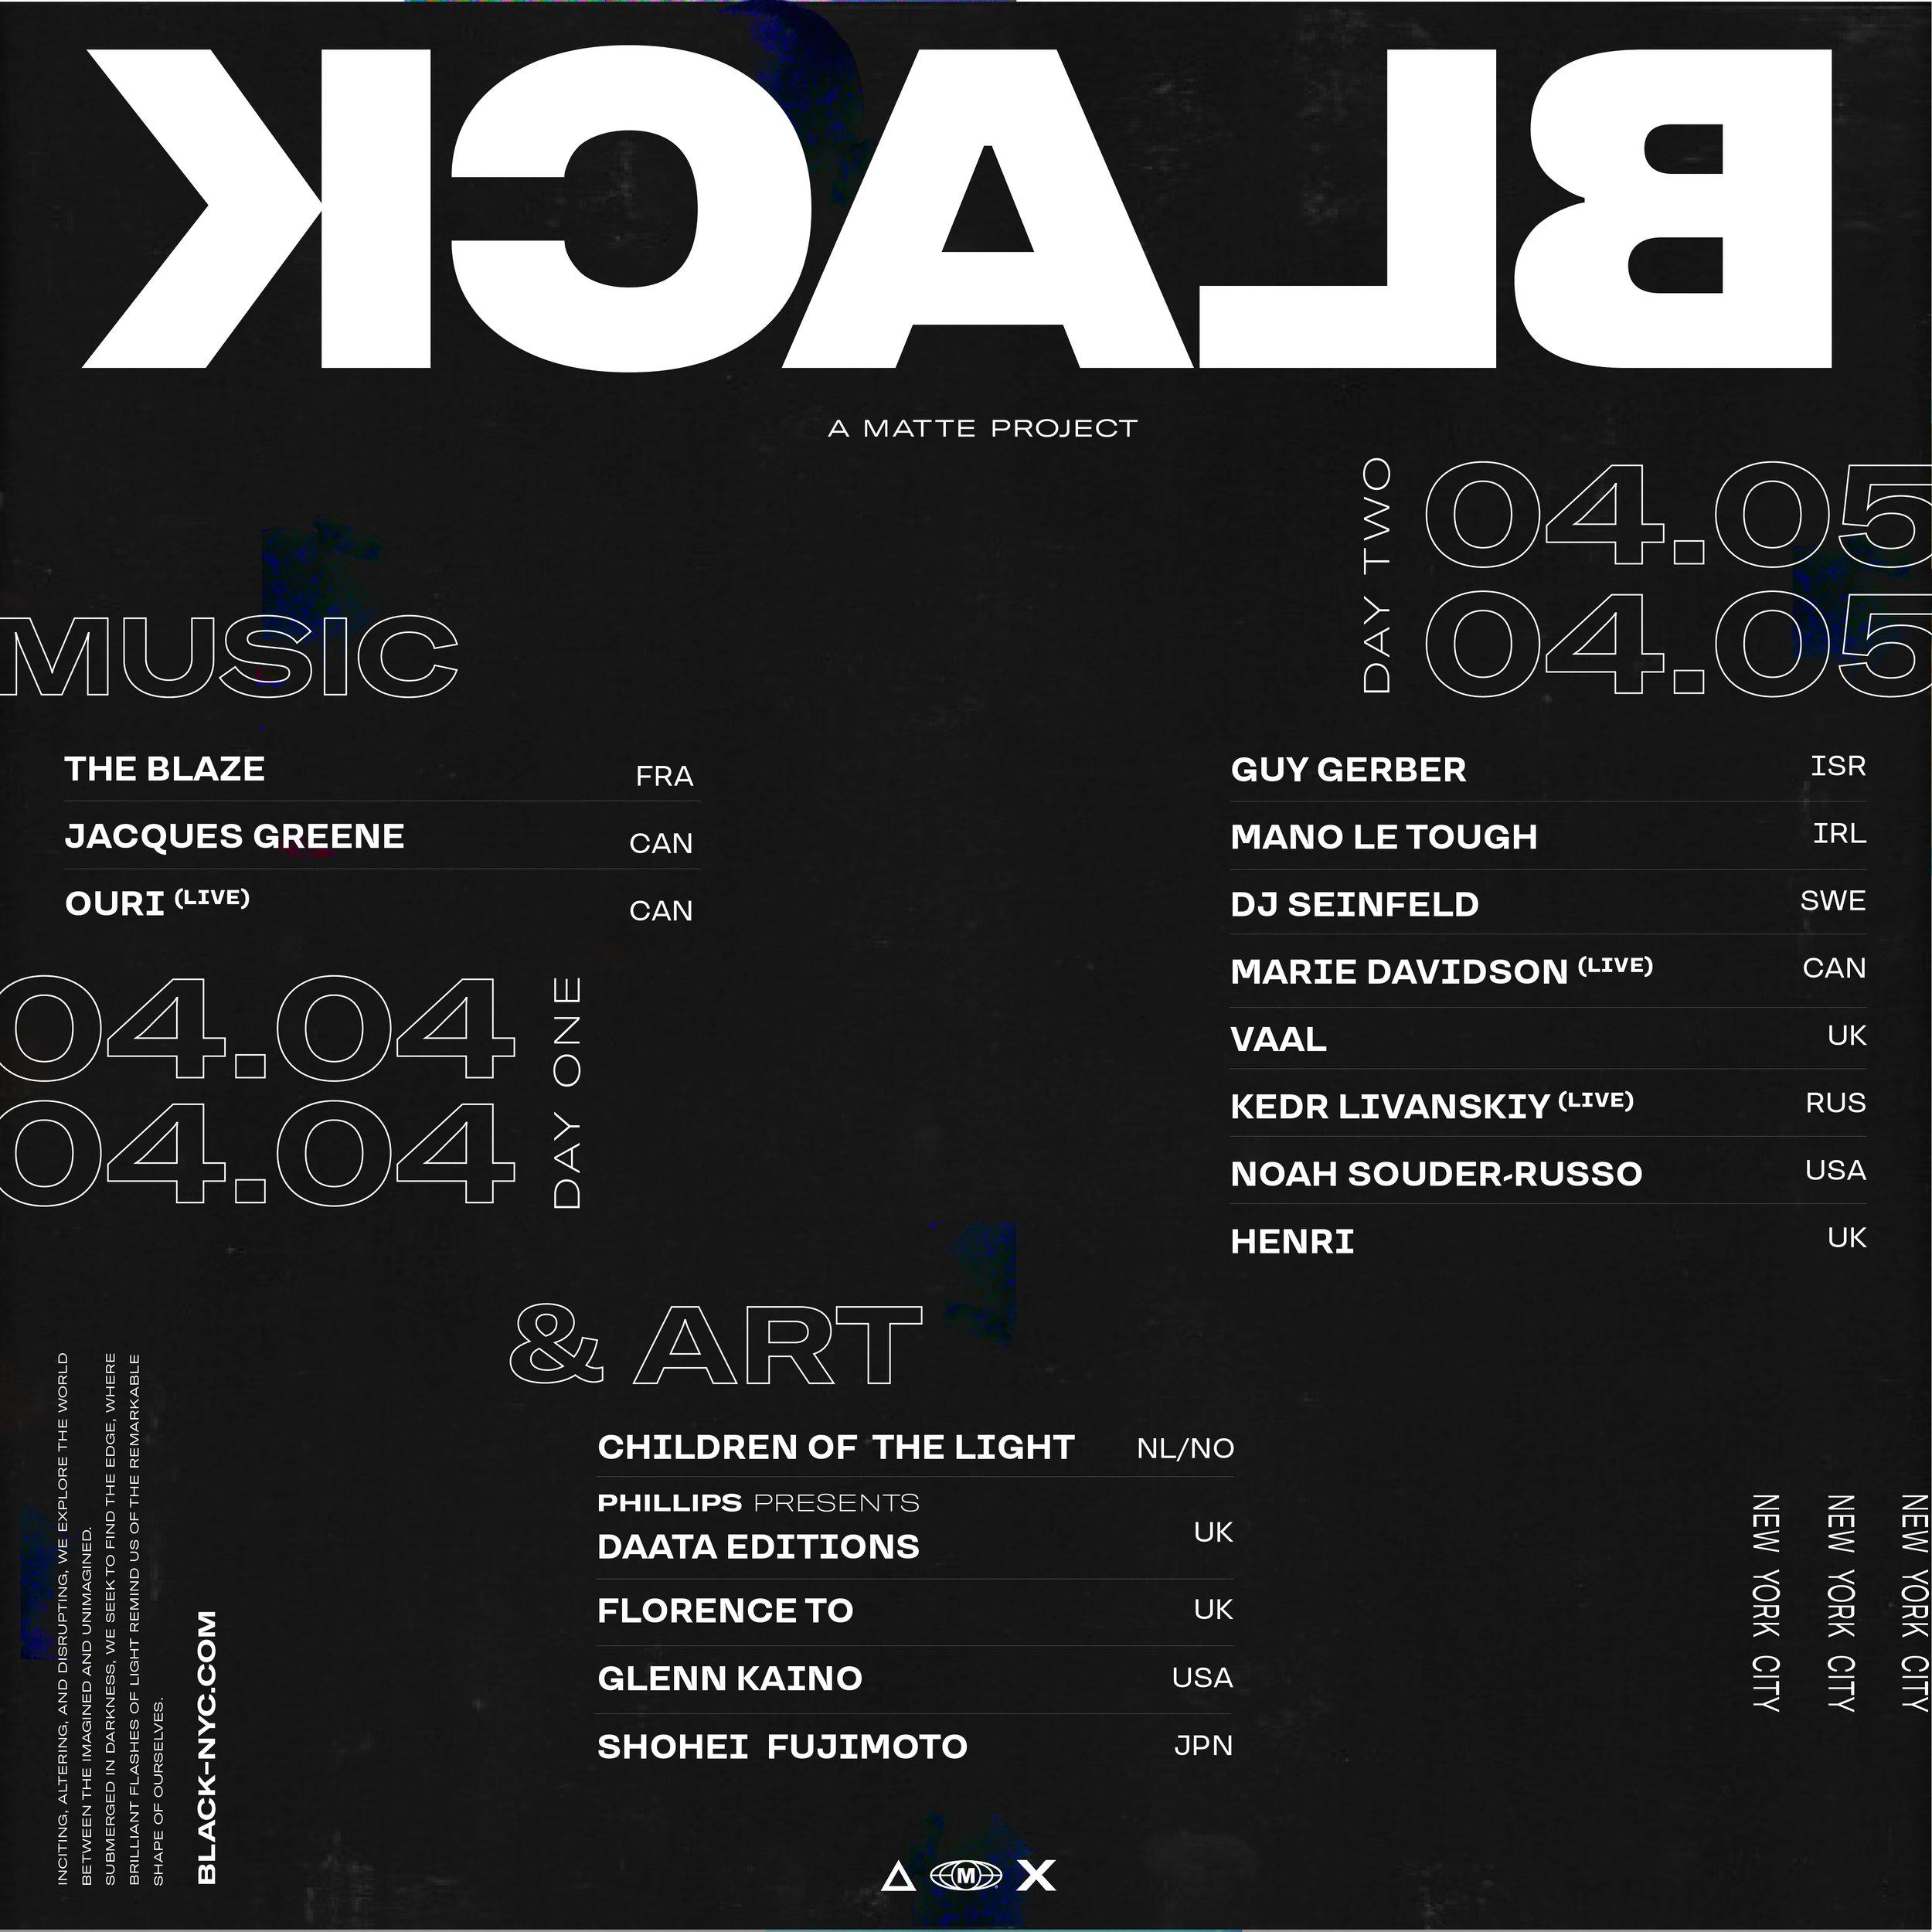 BLACK 2019 - Square.jpg